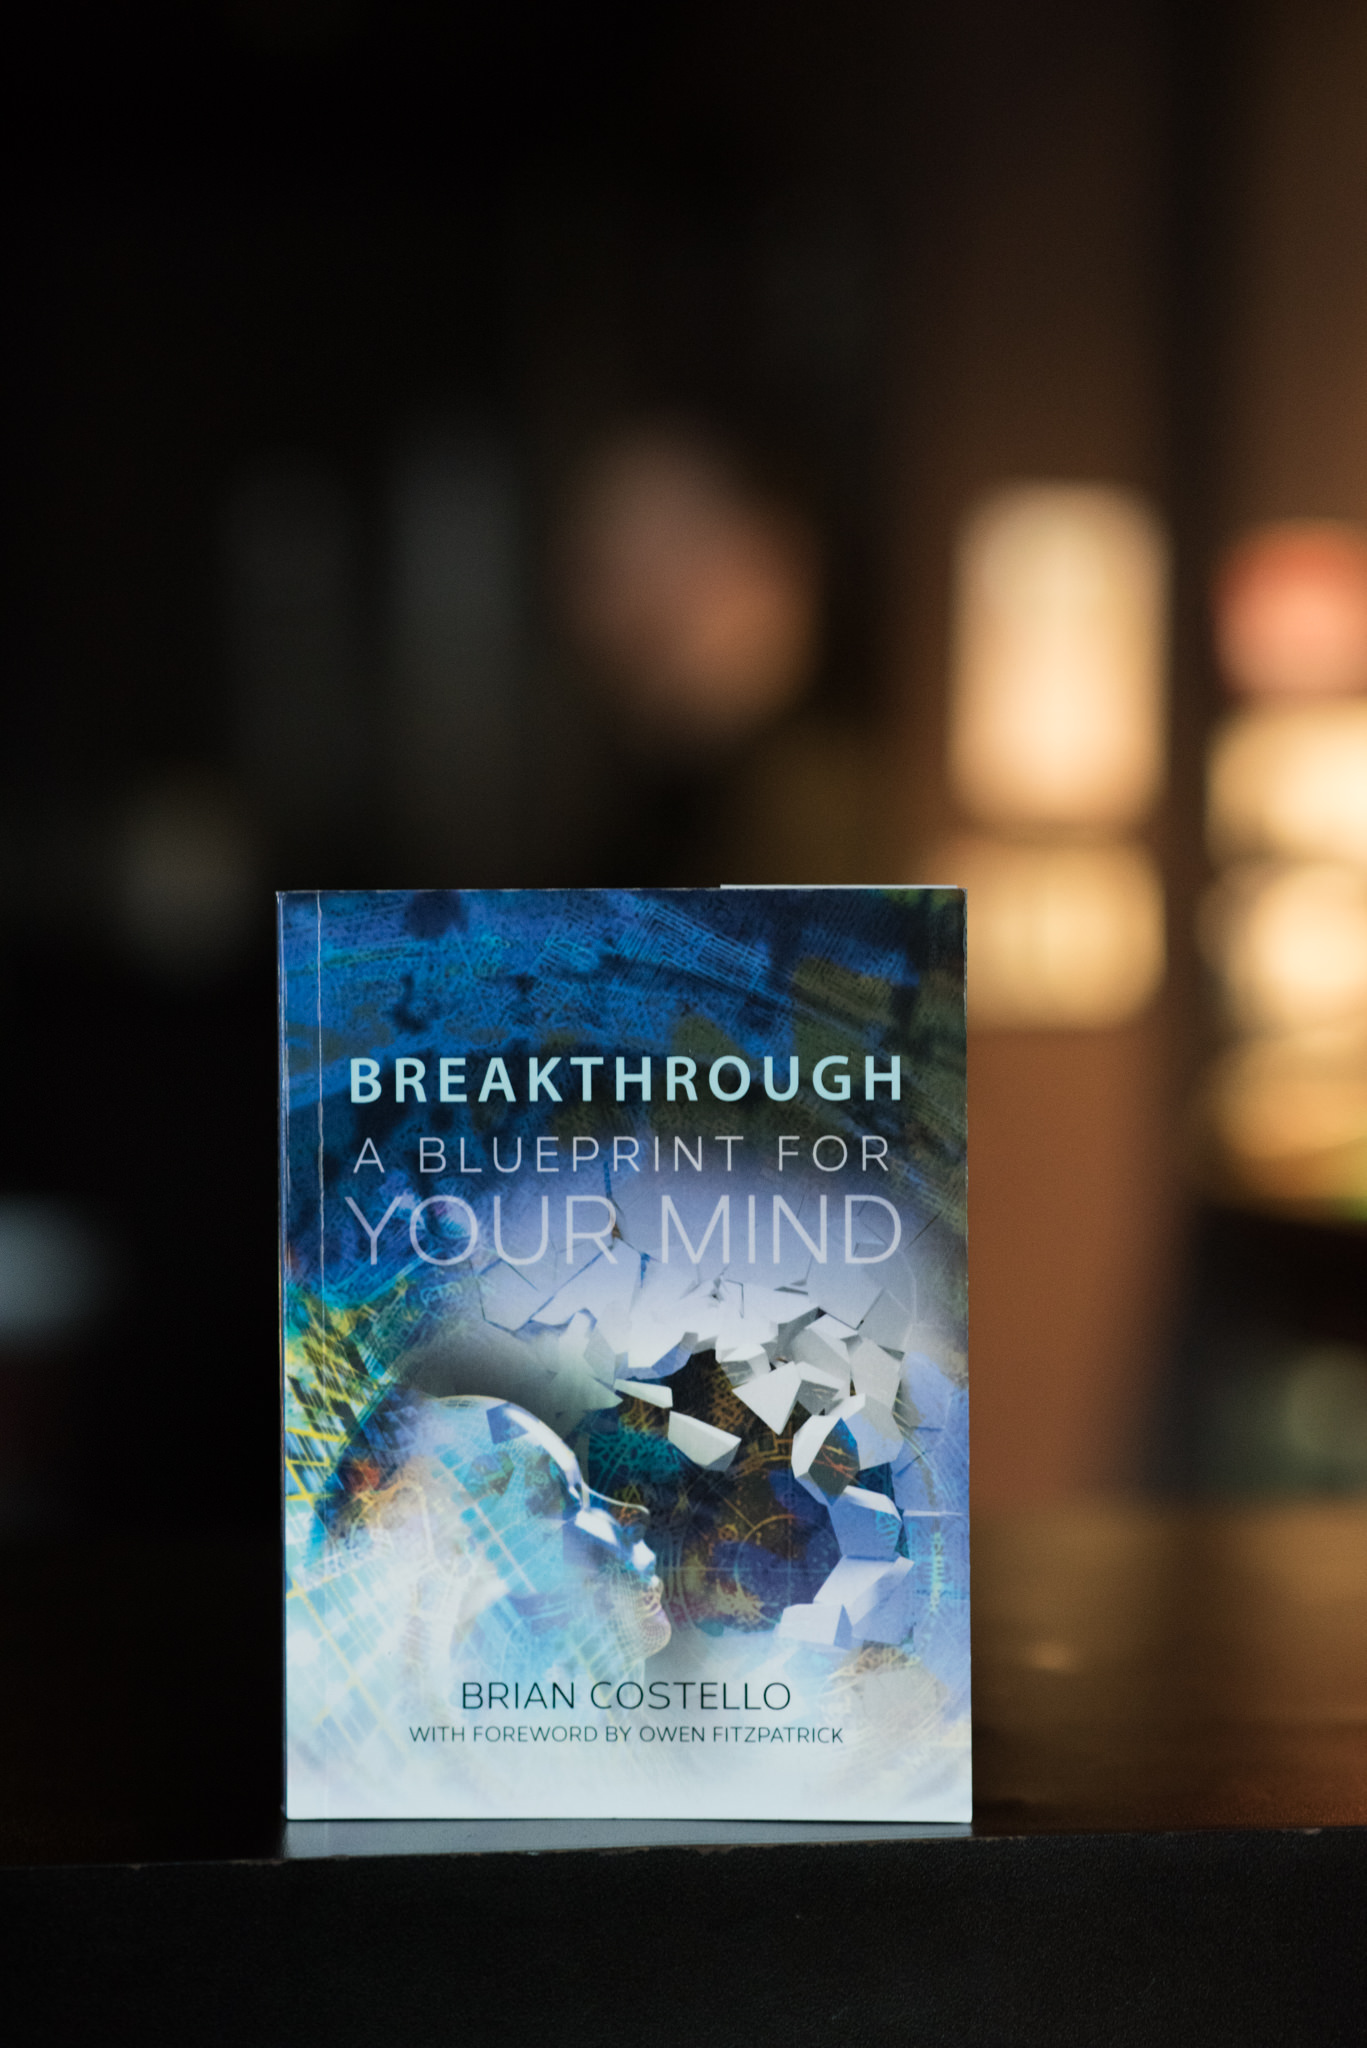 Breakthrough - Brian Costello - book launch - 29 Glasgow - 17 January 2016 © Julie Broadfoot - www.juliebee.co.uk